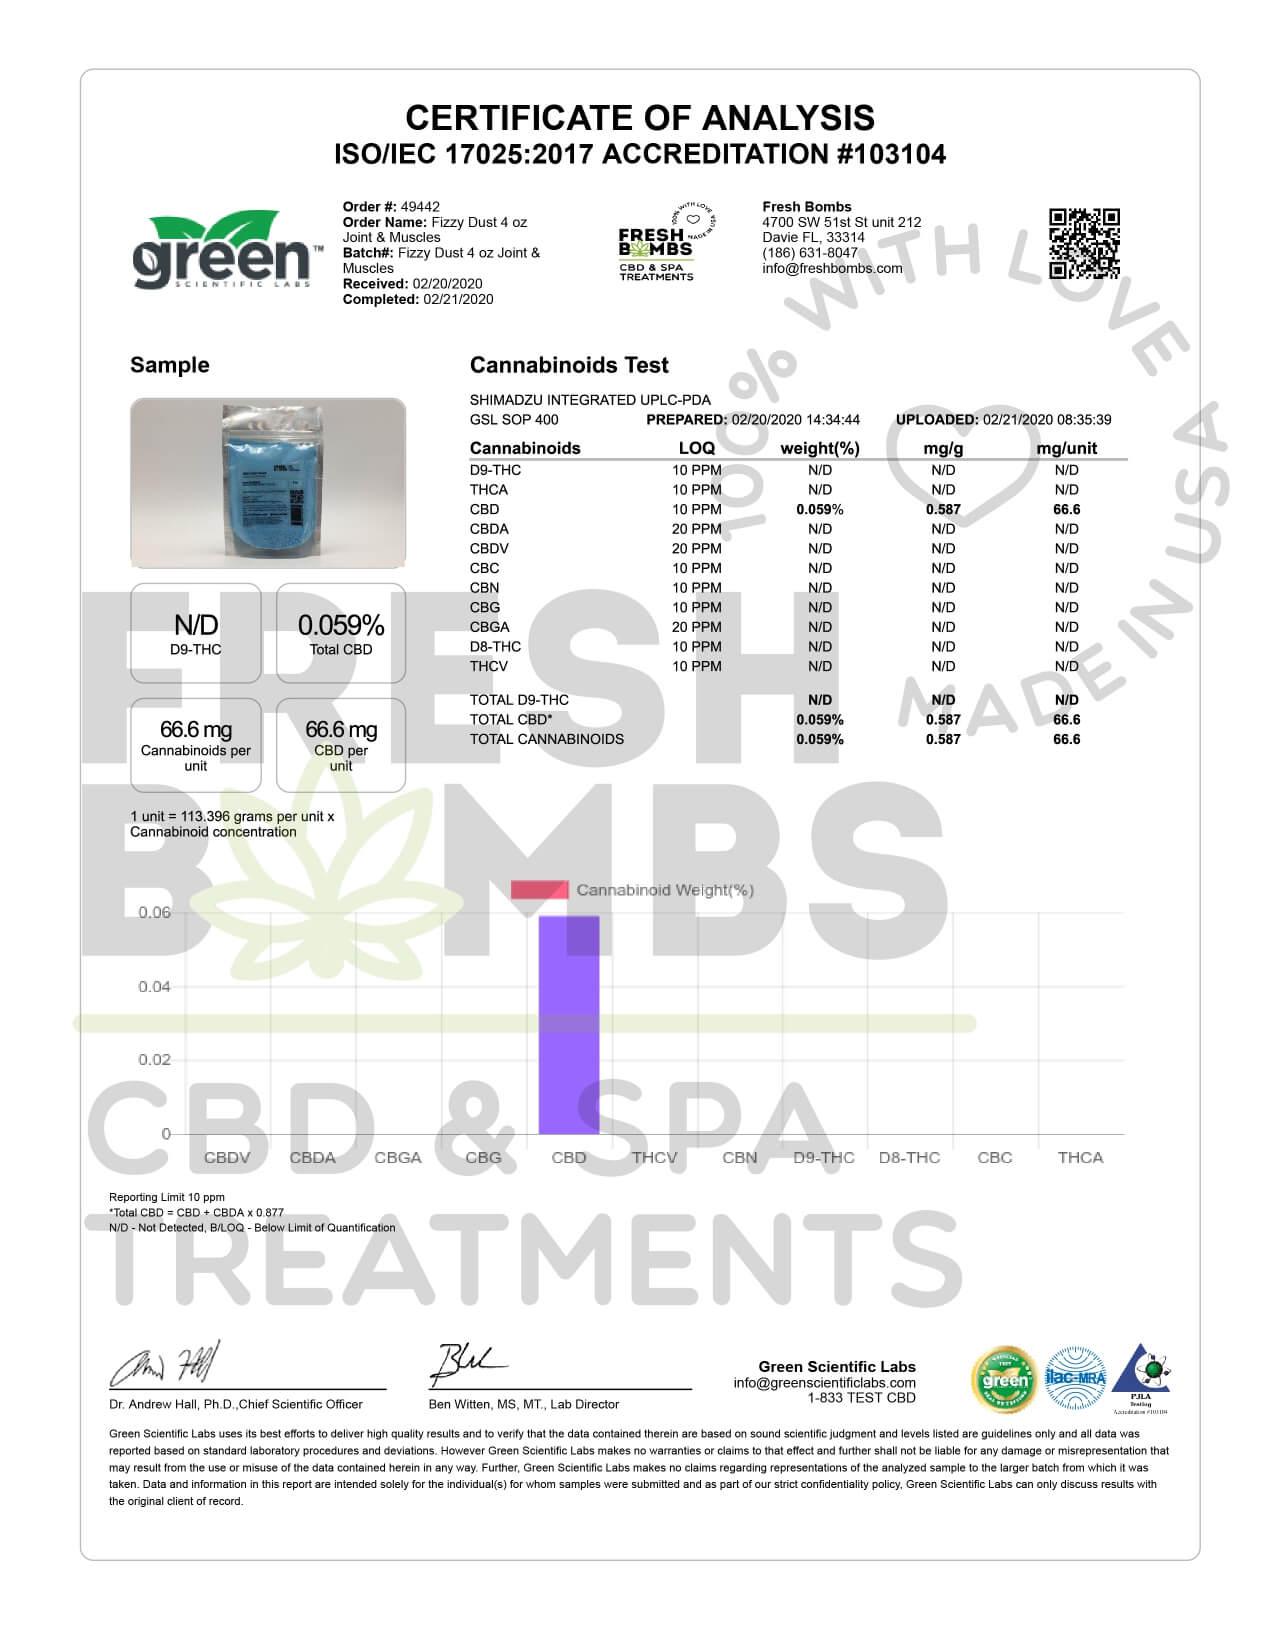 Fresh Bombs CBD Bath Muscles & Joint Fizzy Dust 4oz 50mg Lab Report